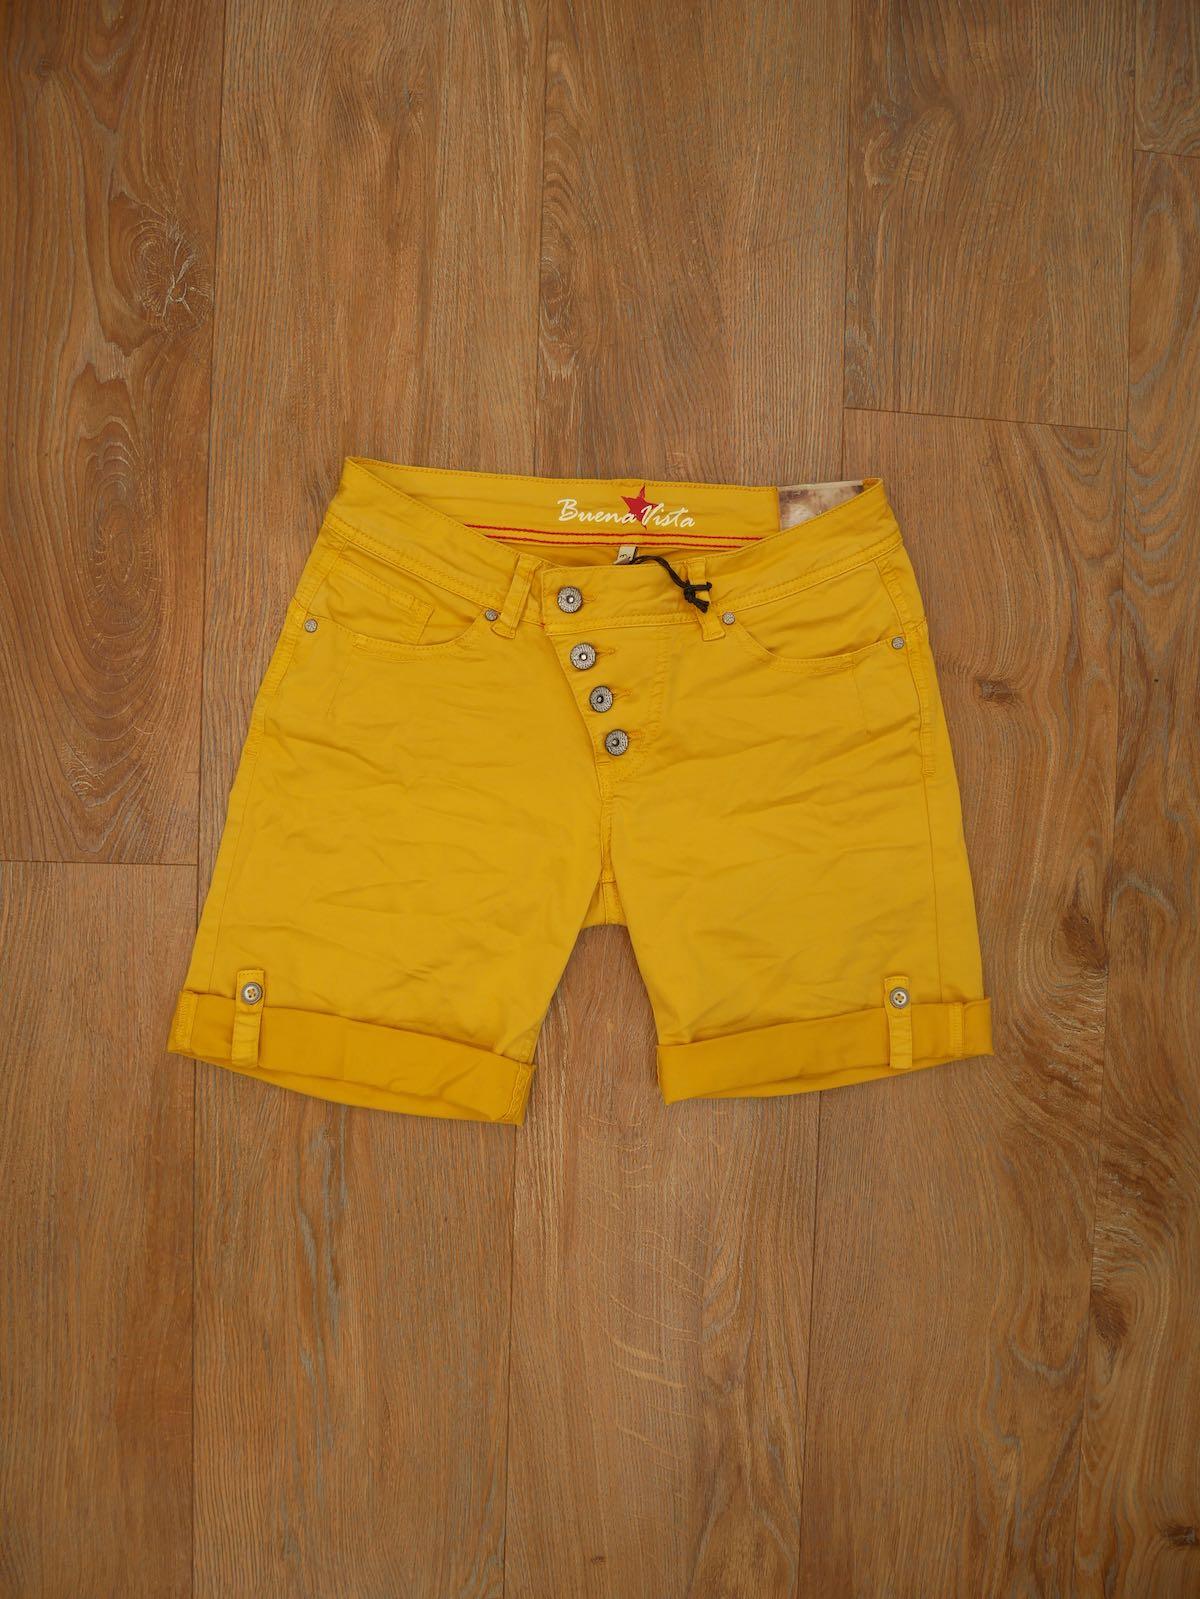 Bunea Vista Malibu Short gelb 3